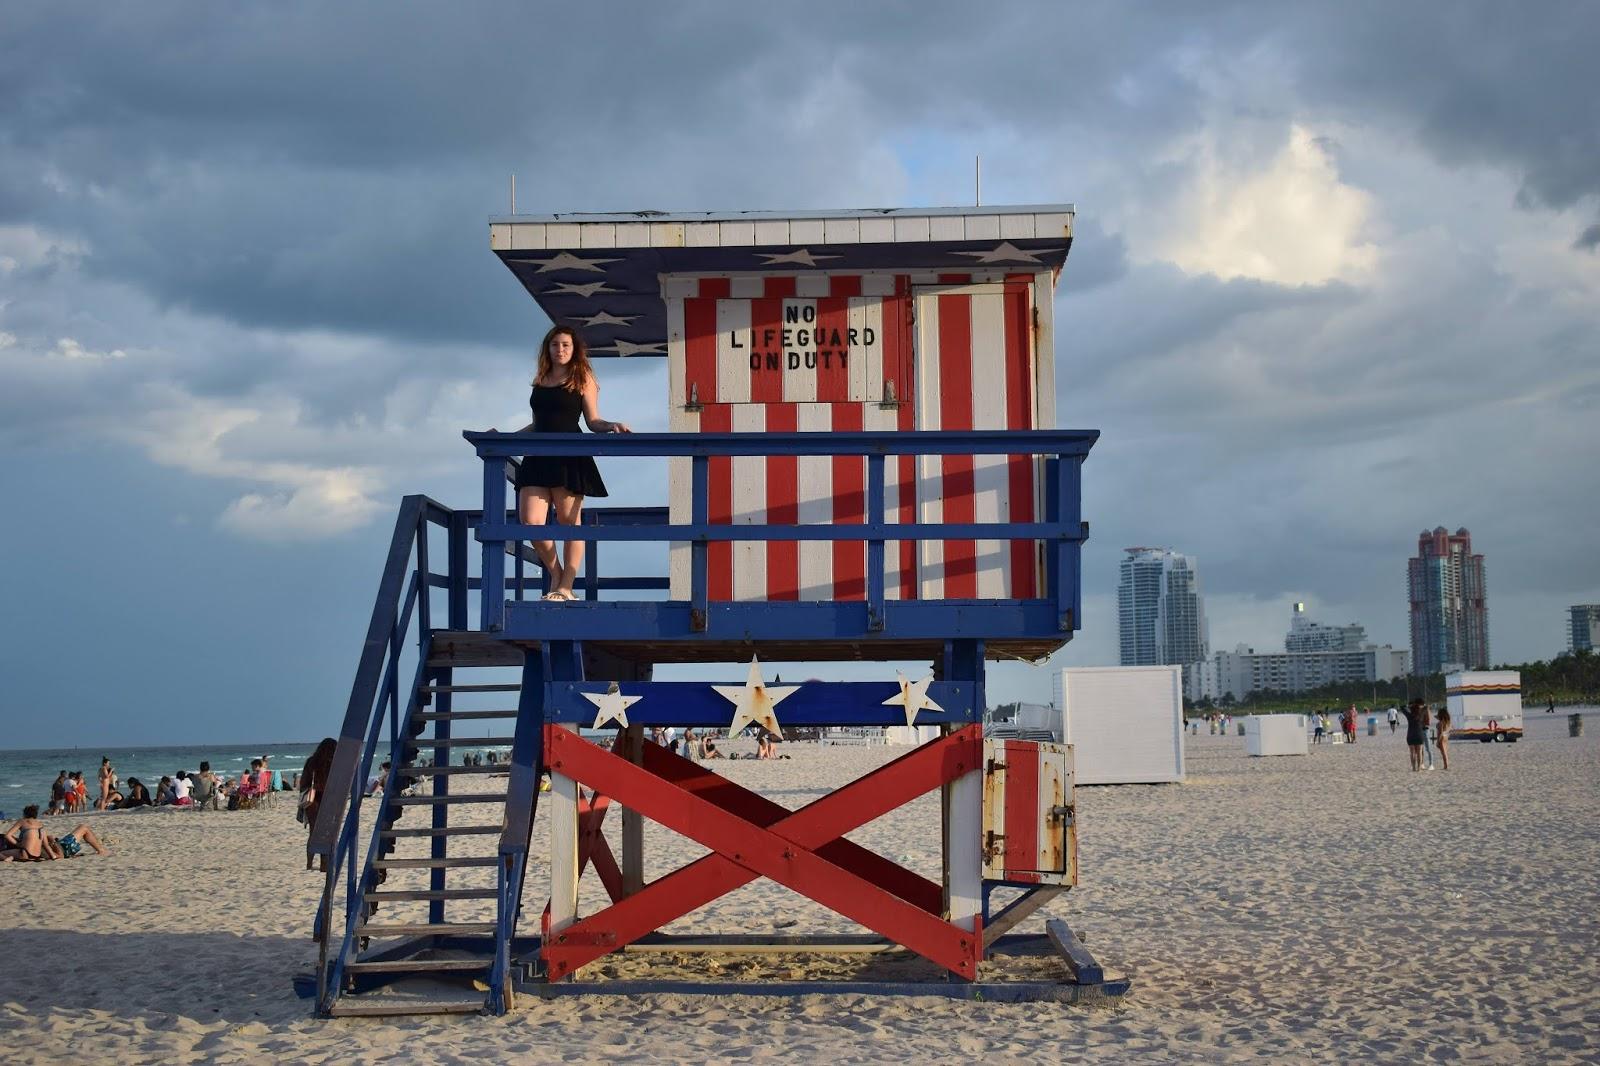 Lifeguard house Miami